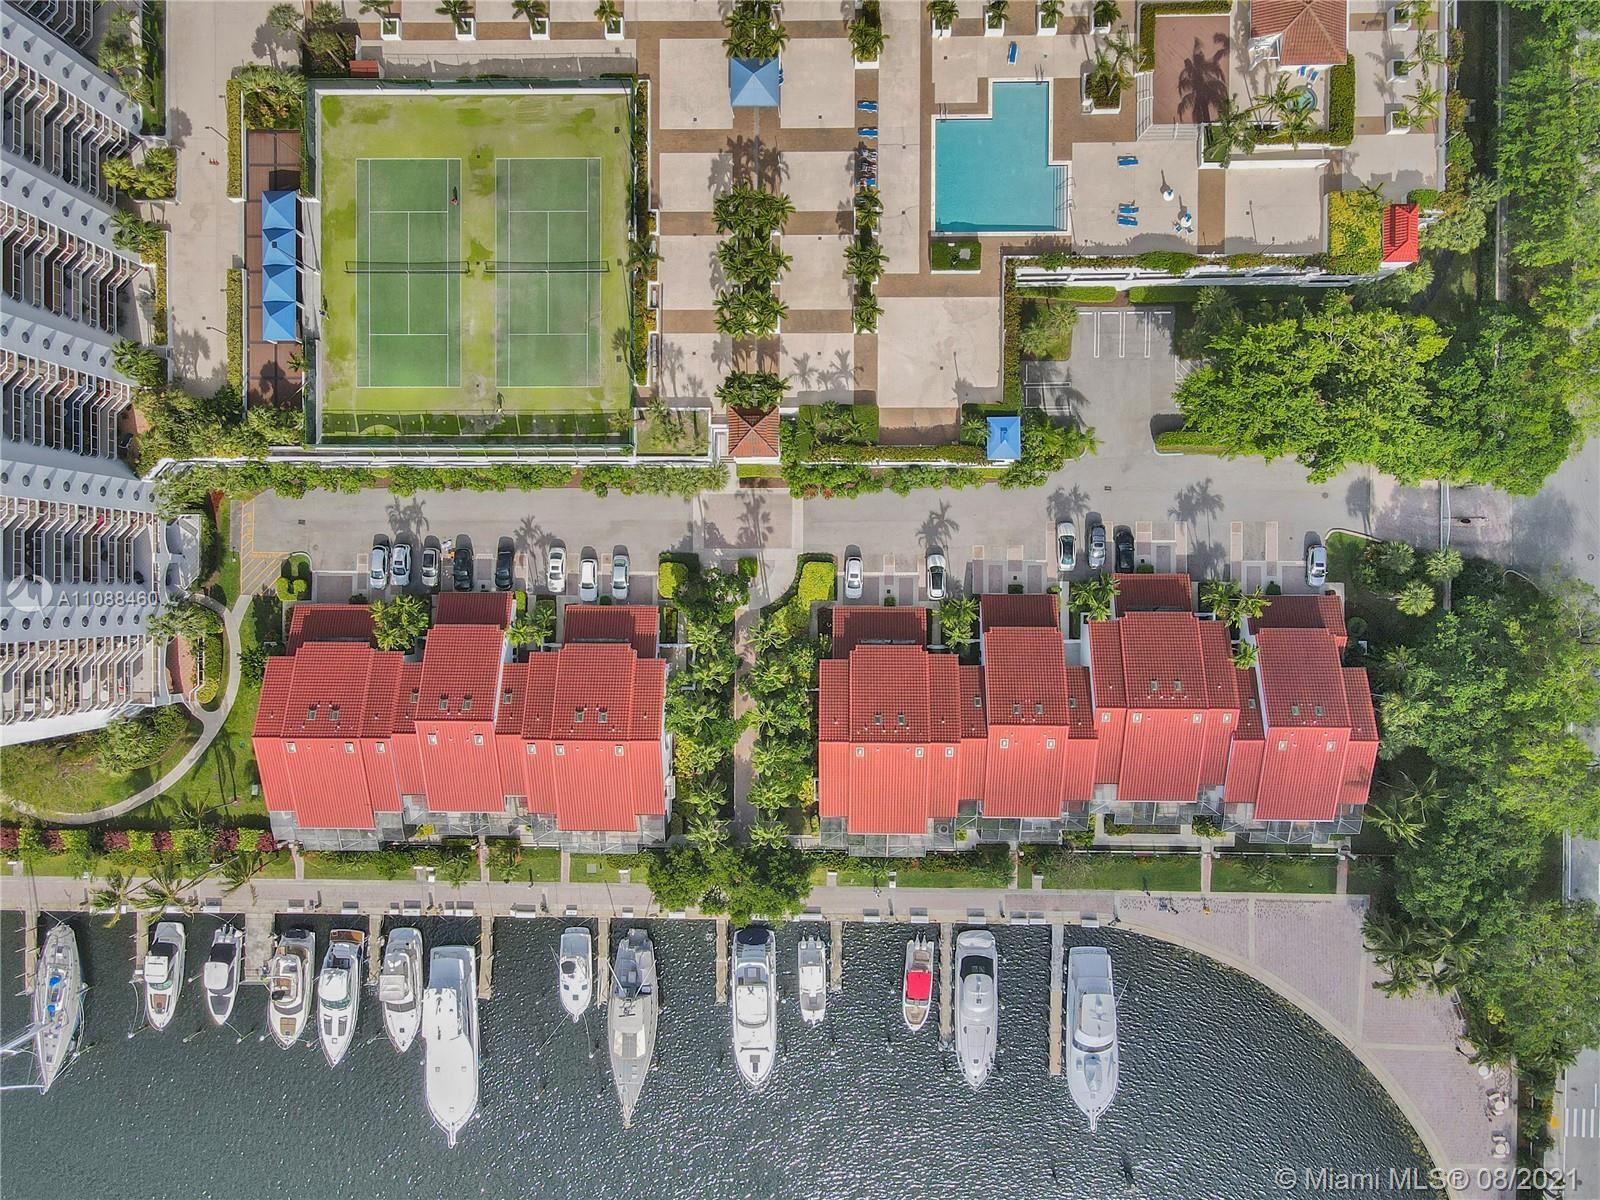 Photo of 3620 Yacht Club Dr #503, Aventura, FL 33180 (MLS # A11088460)